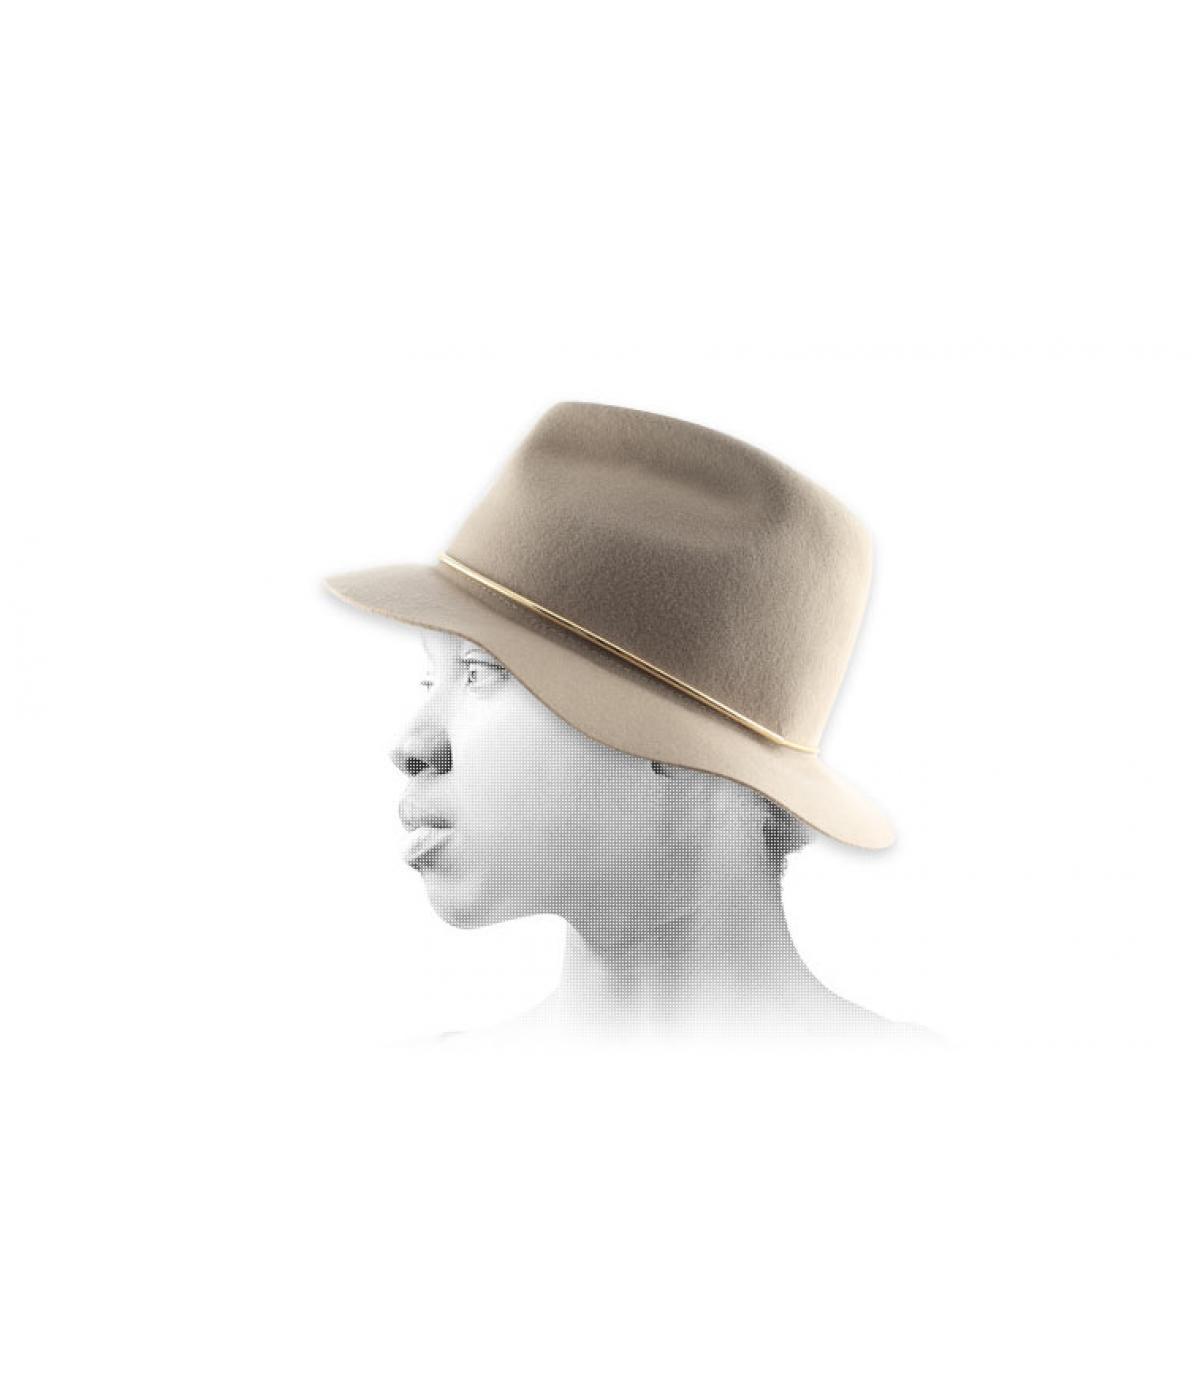 Vrouwen fedora hoed